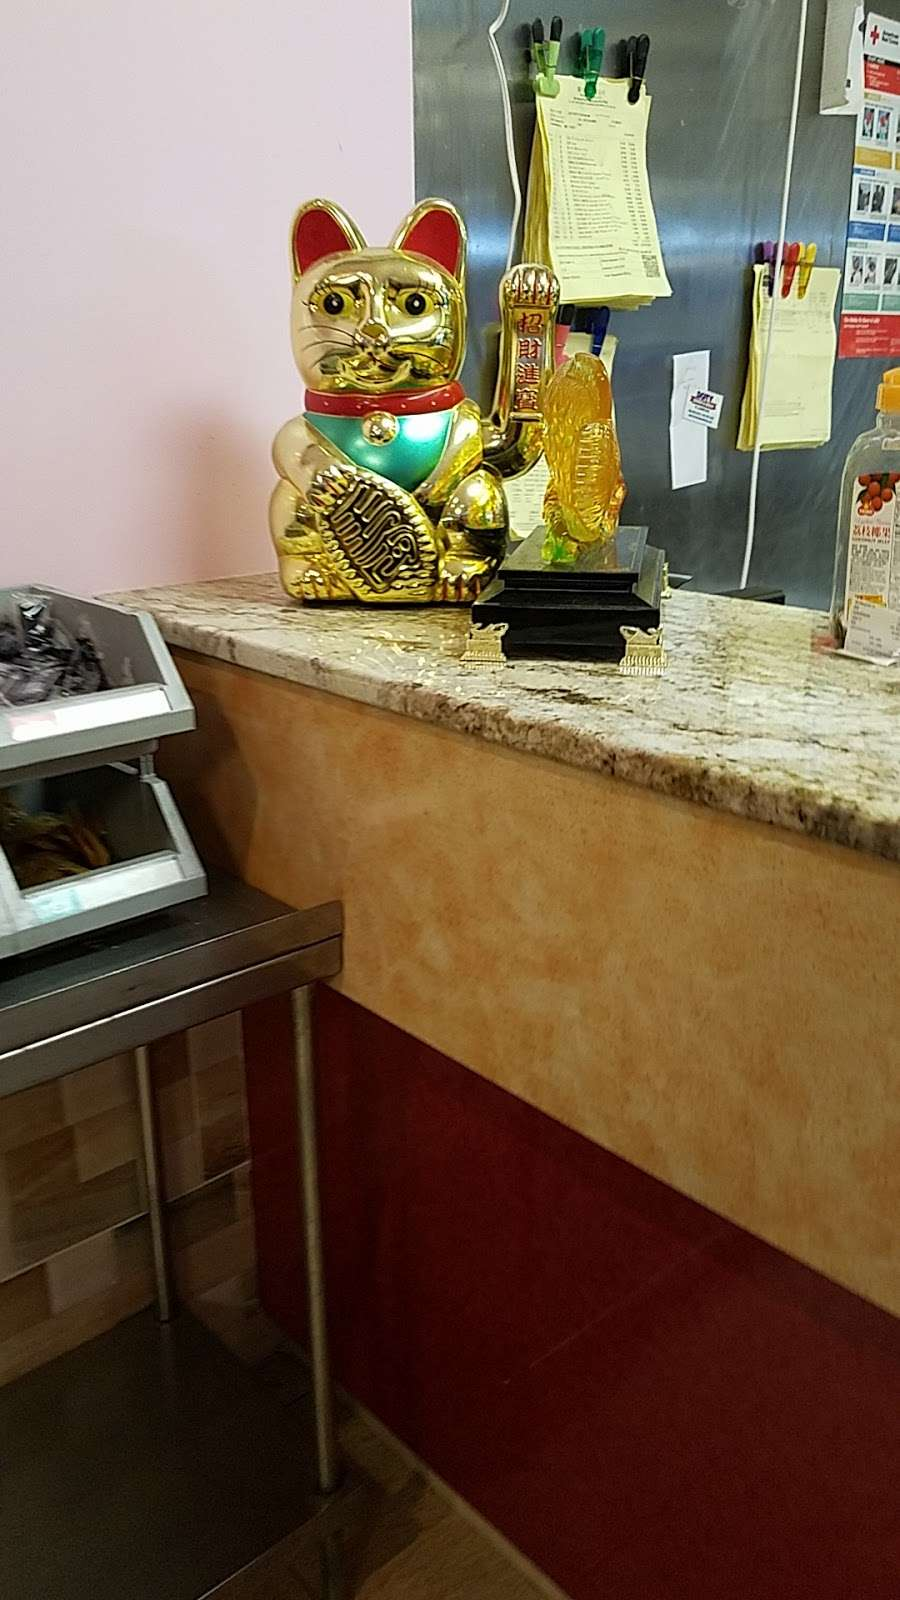 Great Wall Restaurant - restaurant  | Photo 3 of 6 | Address: 3350 Hayman Dr, Federalsburg, MD 21632, USA | Phone: (410) 754-8806